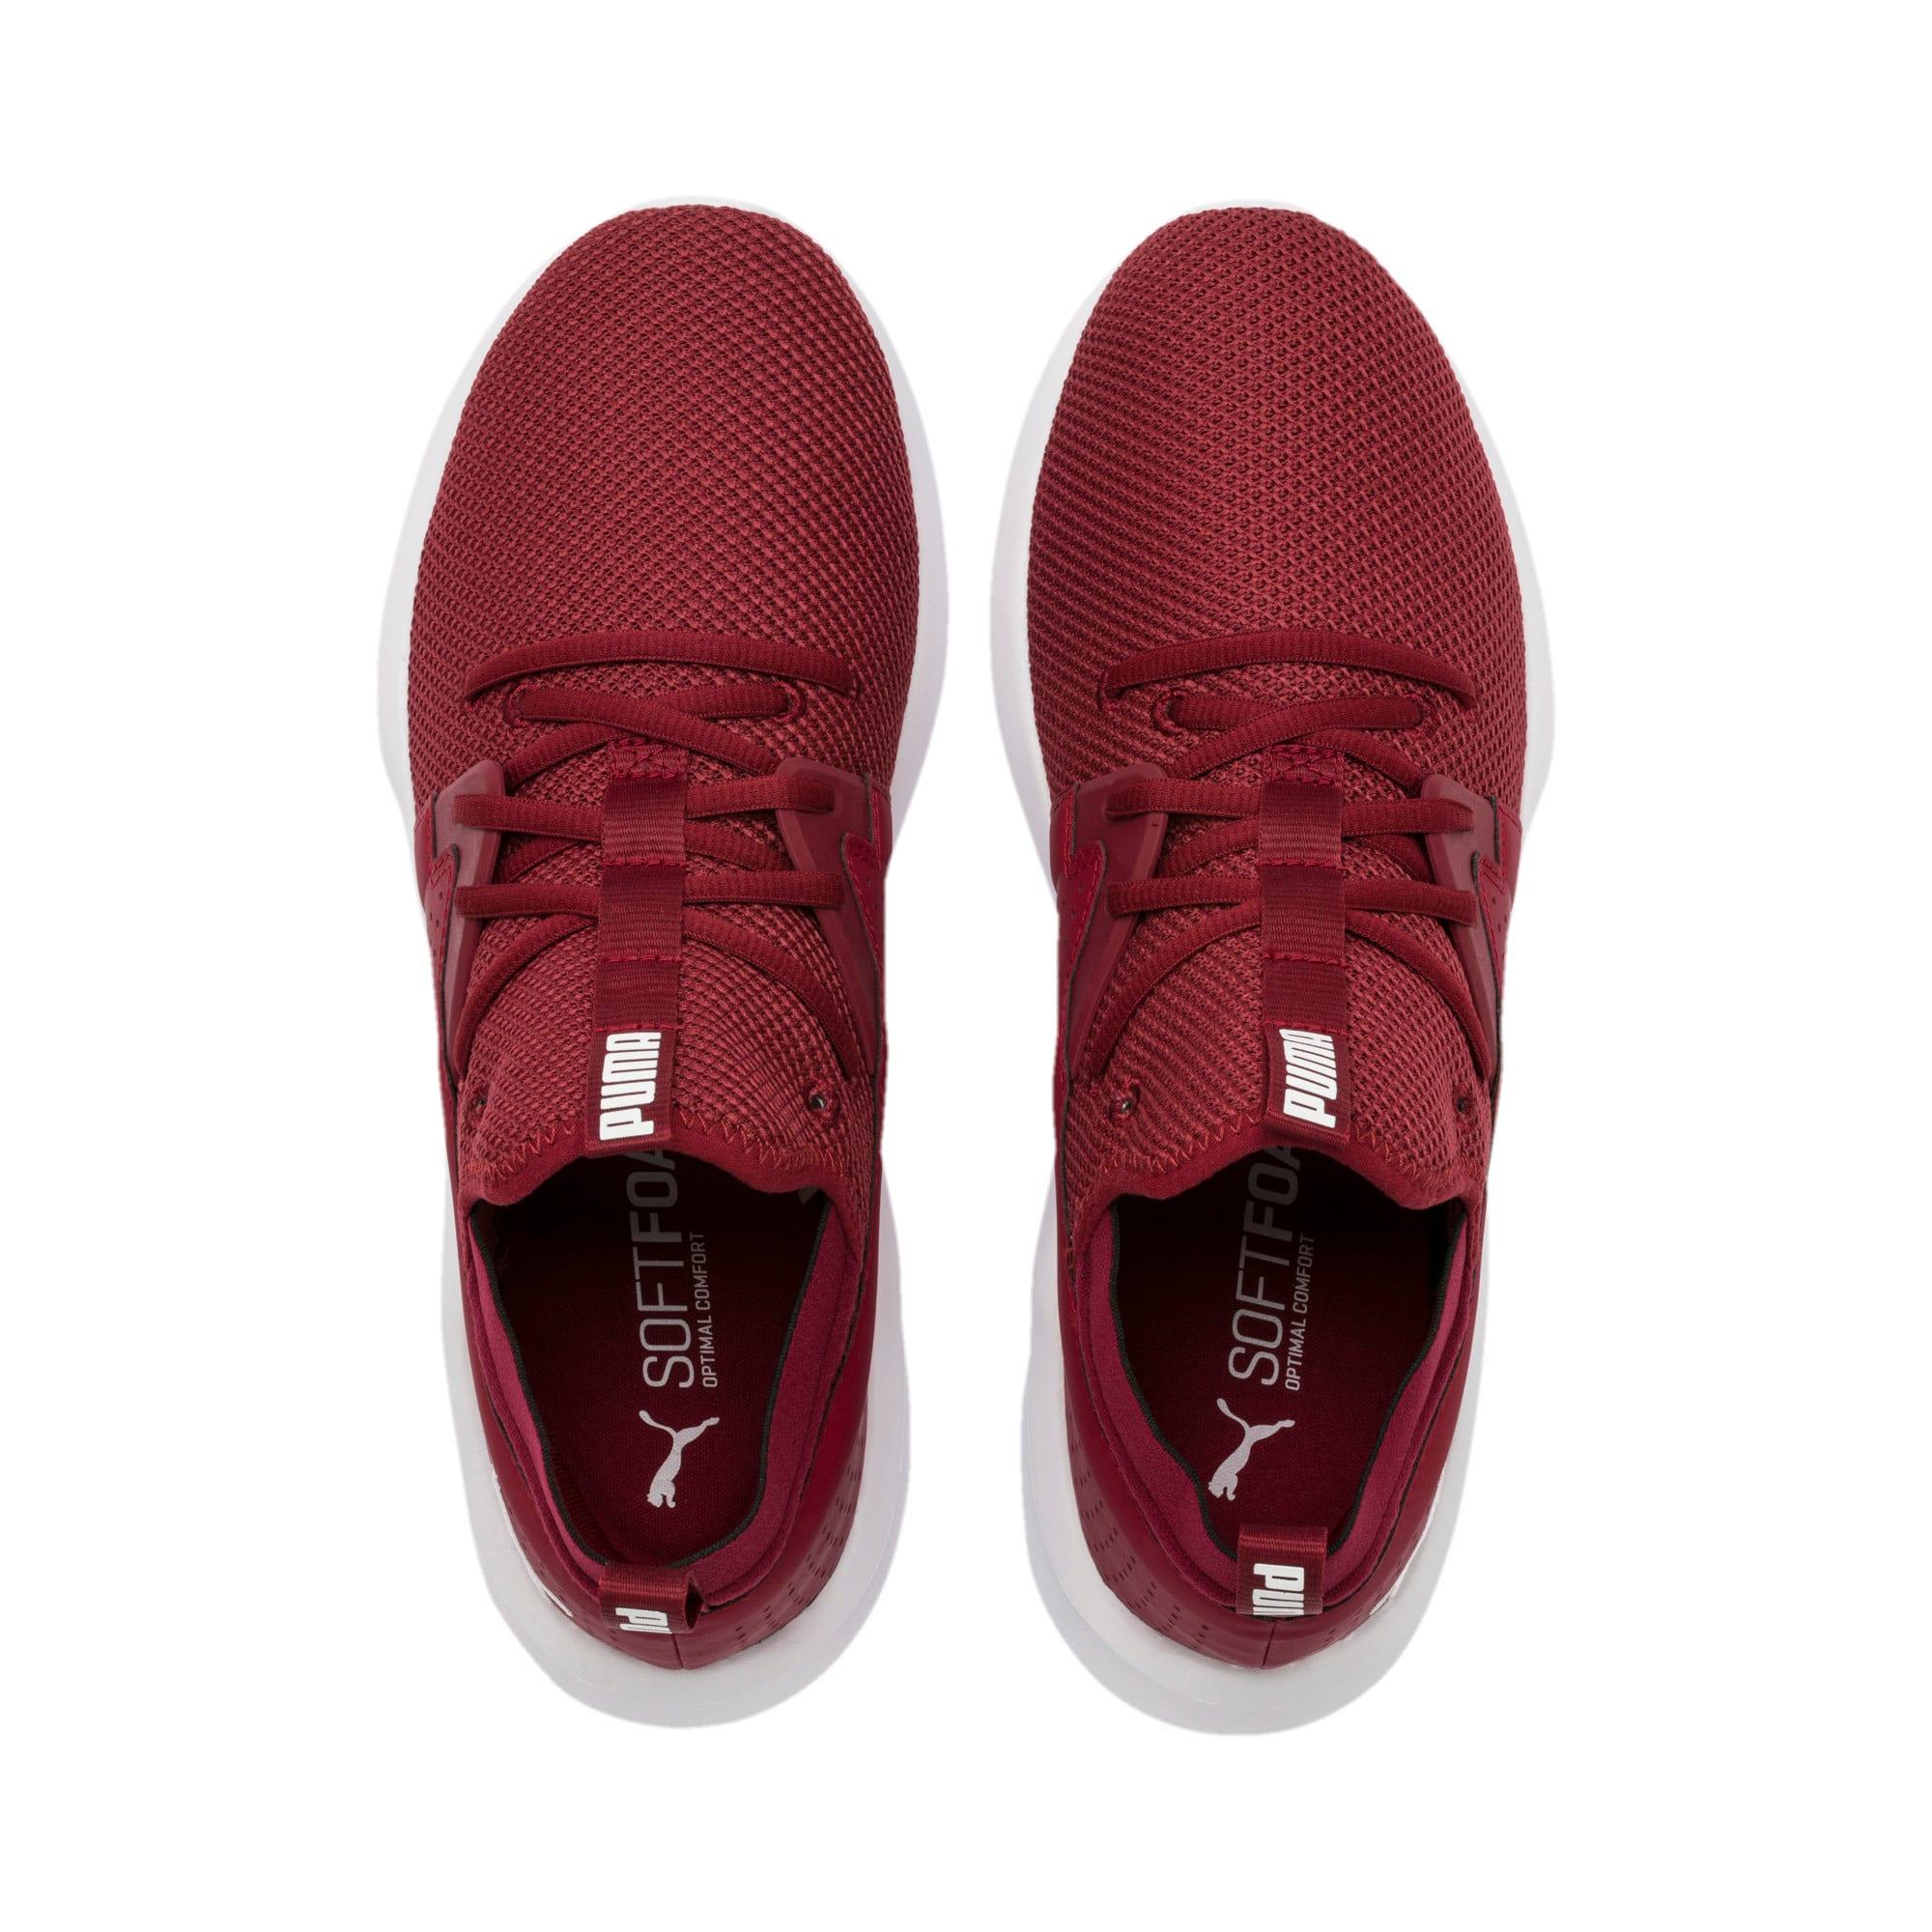 Thumbnail 8 of Emergence Men's Running Shoes, Rhubarb-Puma White, medium-IND